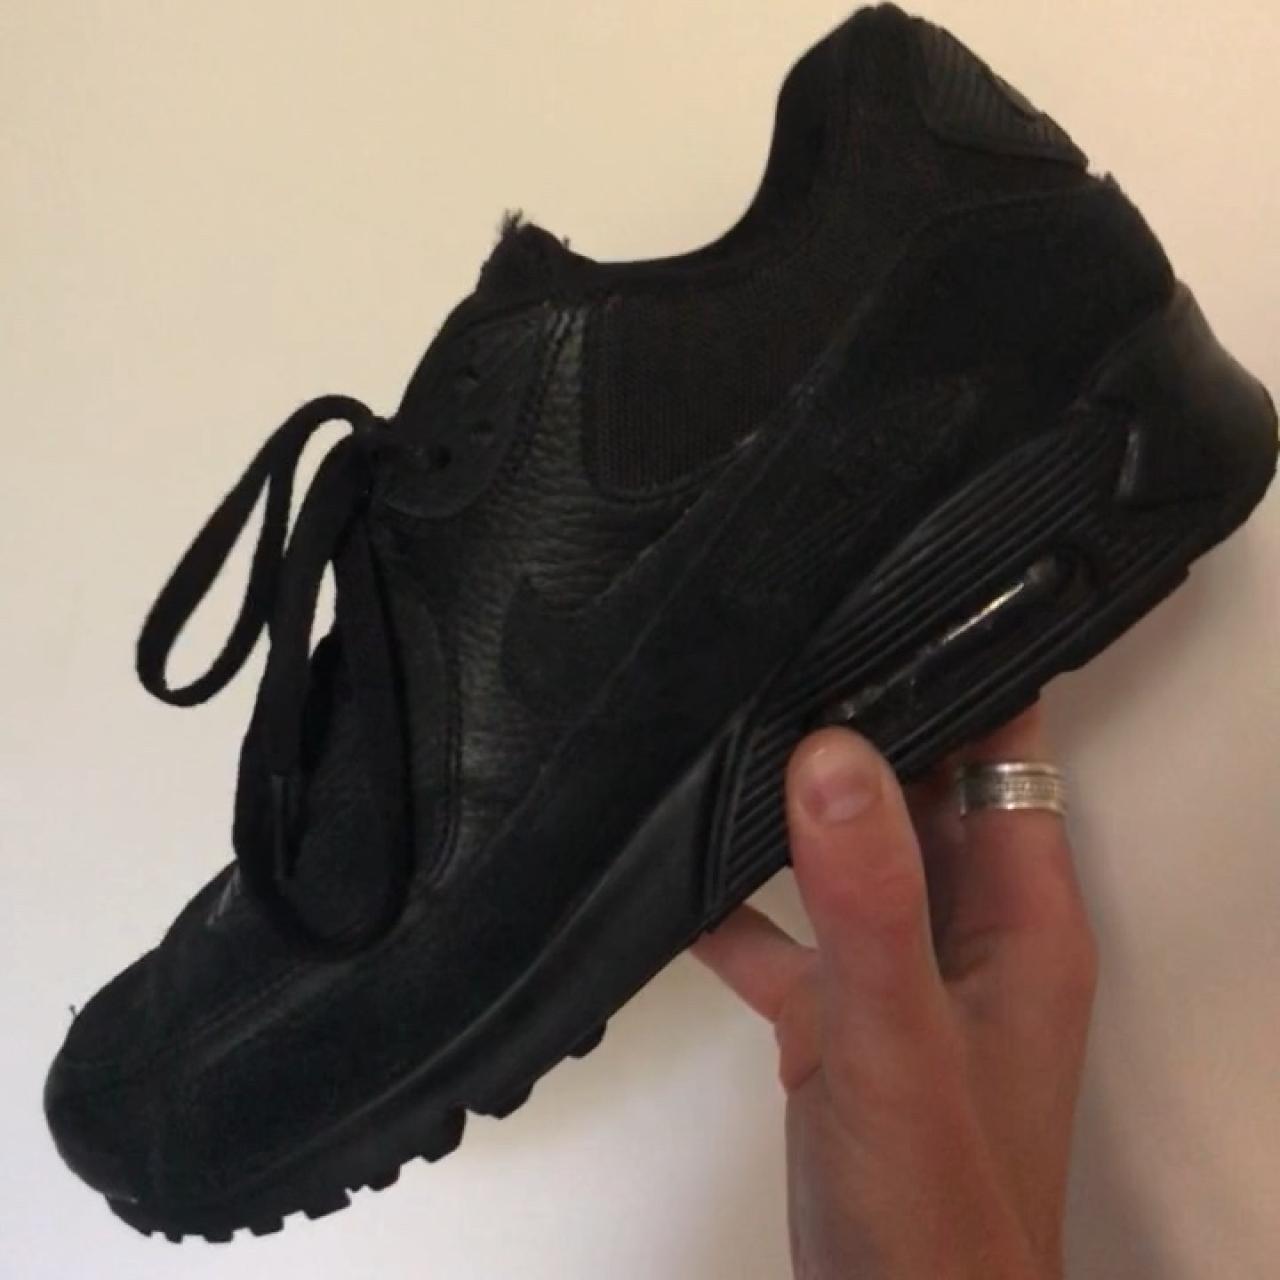 c7df2b75919 Nike air max 90 essentials black leather/ suede. 9/10 only - Depop